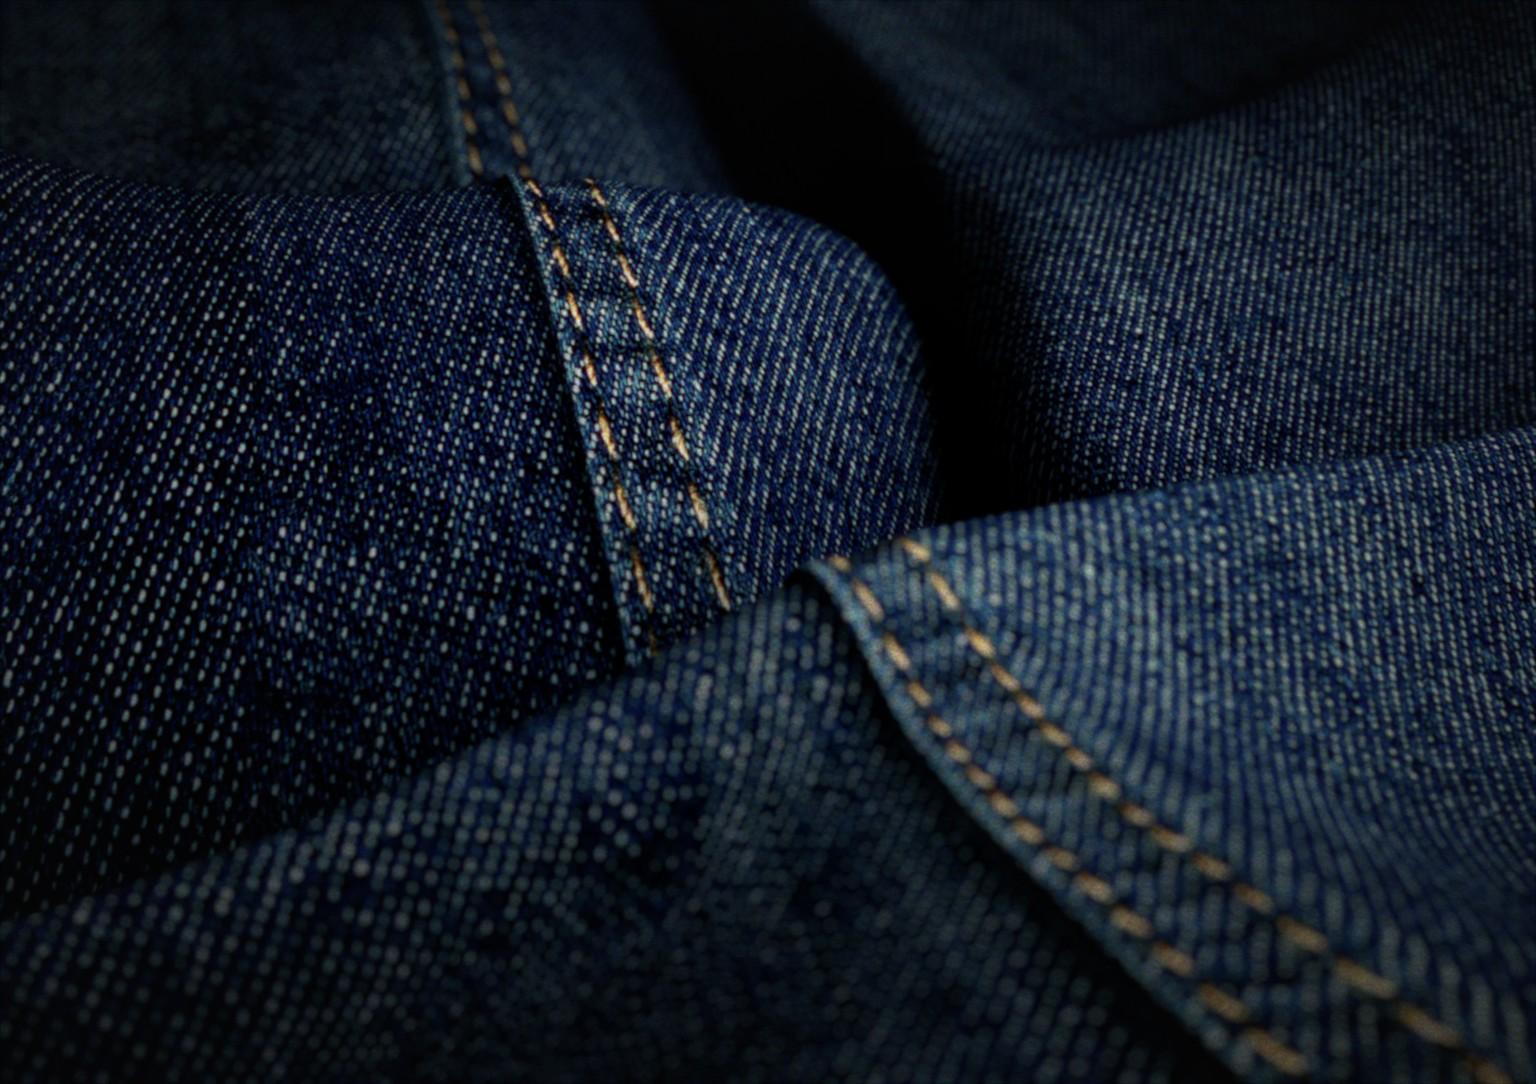 3D Jeans Closeup Clothing Illustration